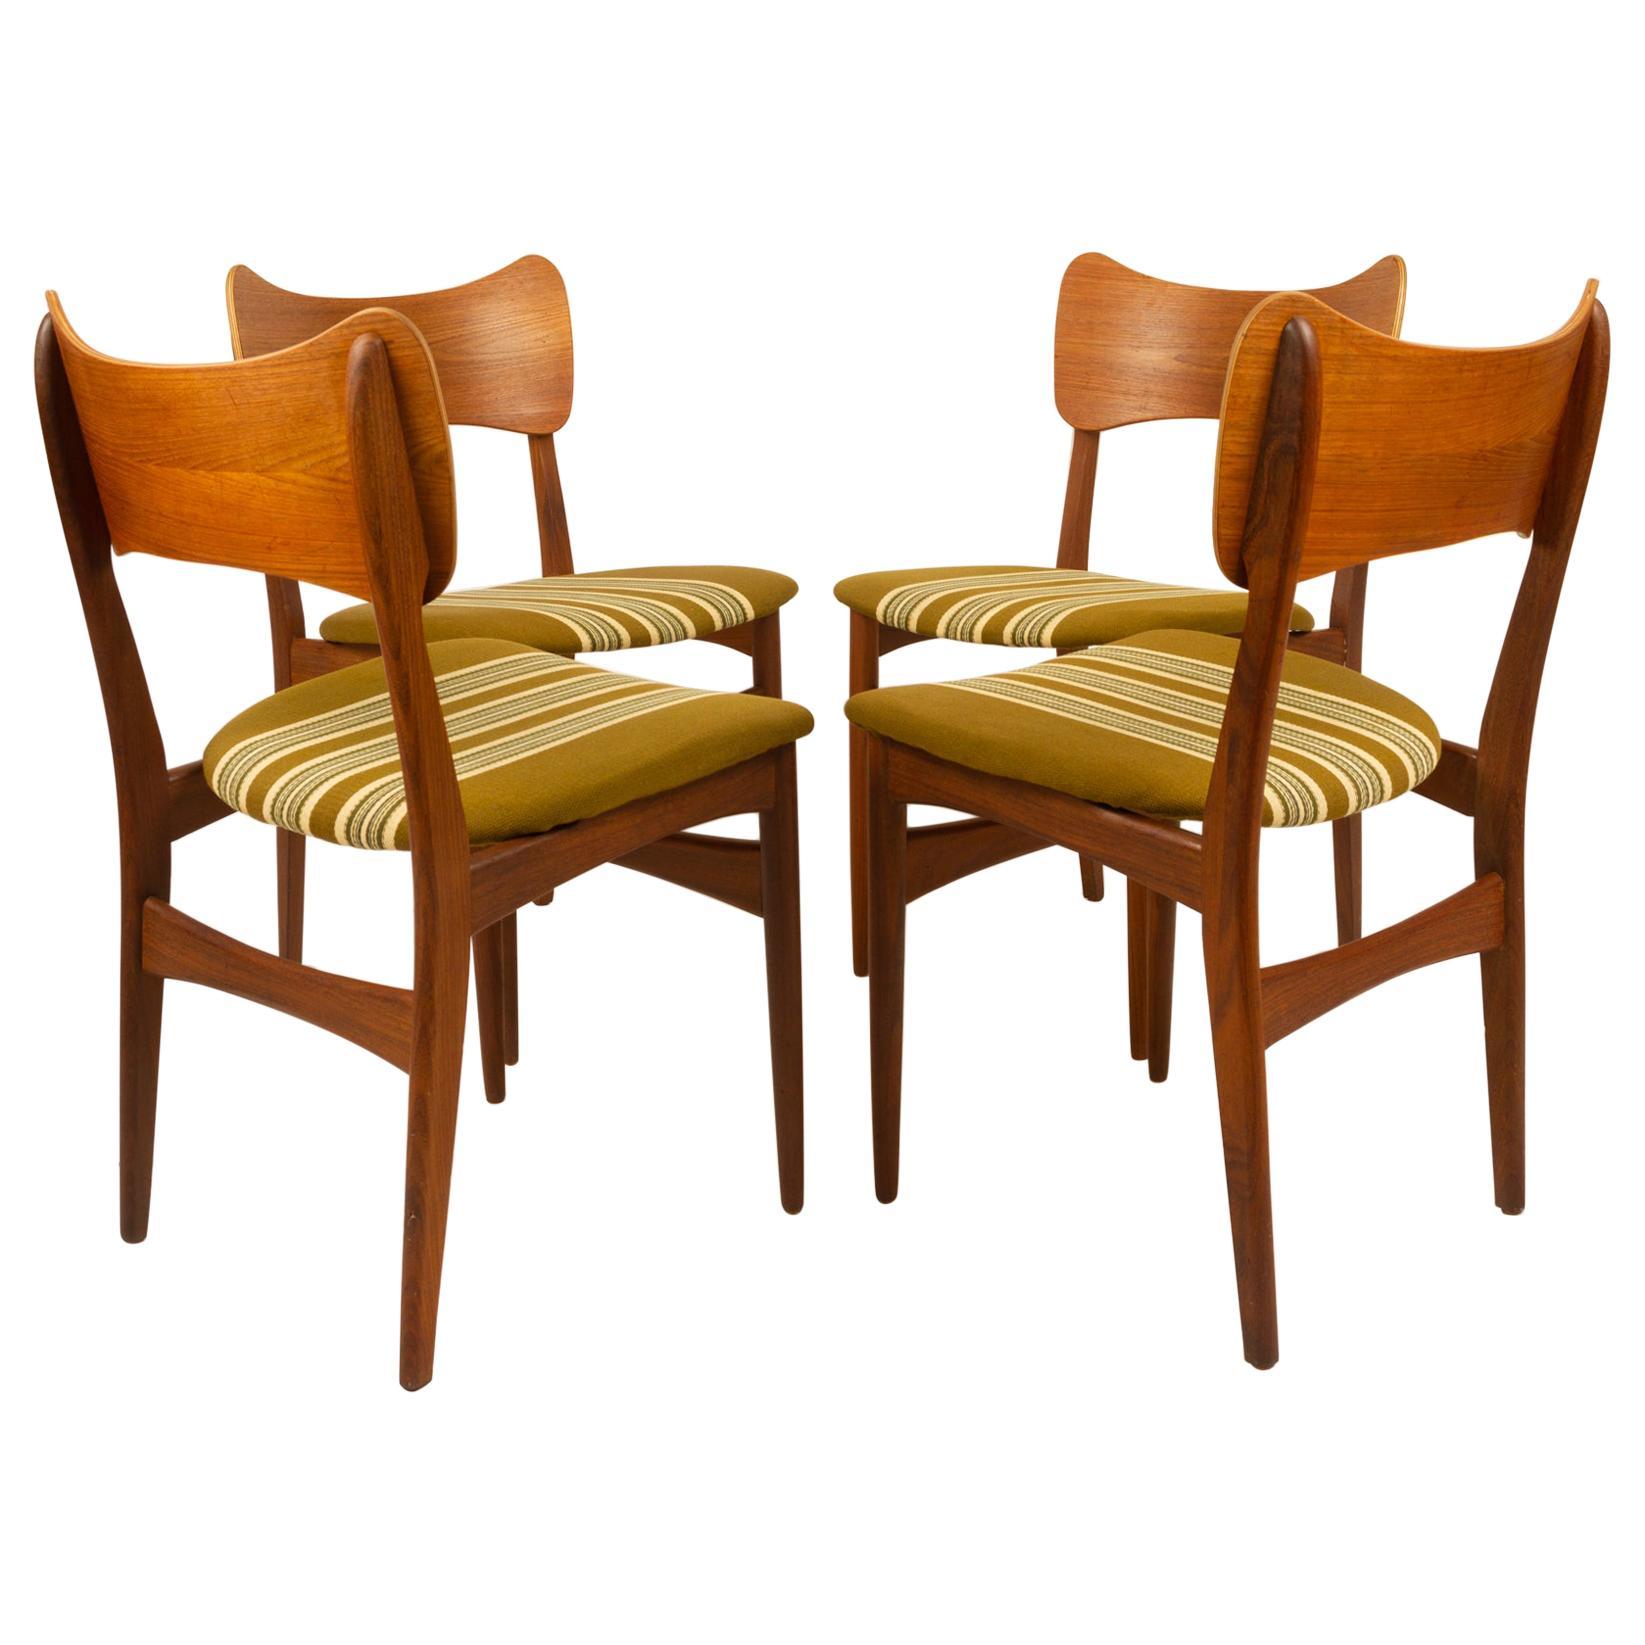 Vintage Danish Teak Dining Chairs 1960s Set of 4